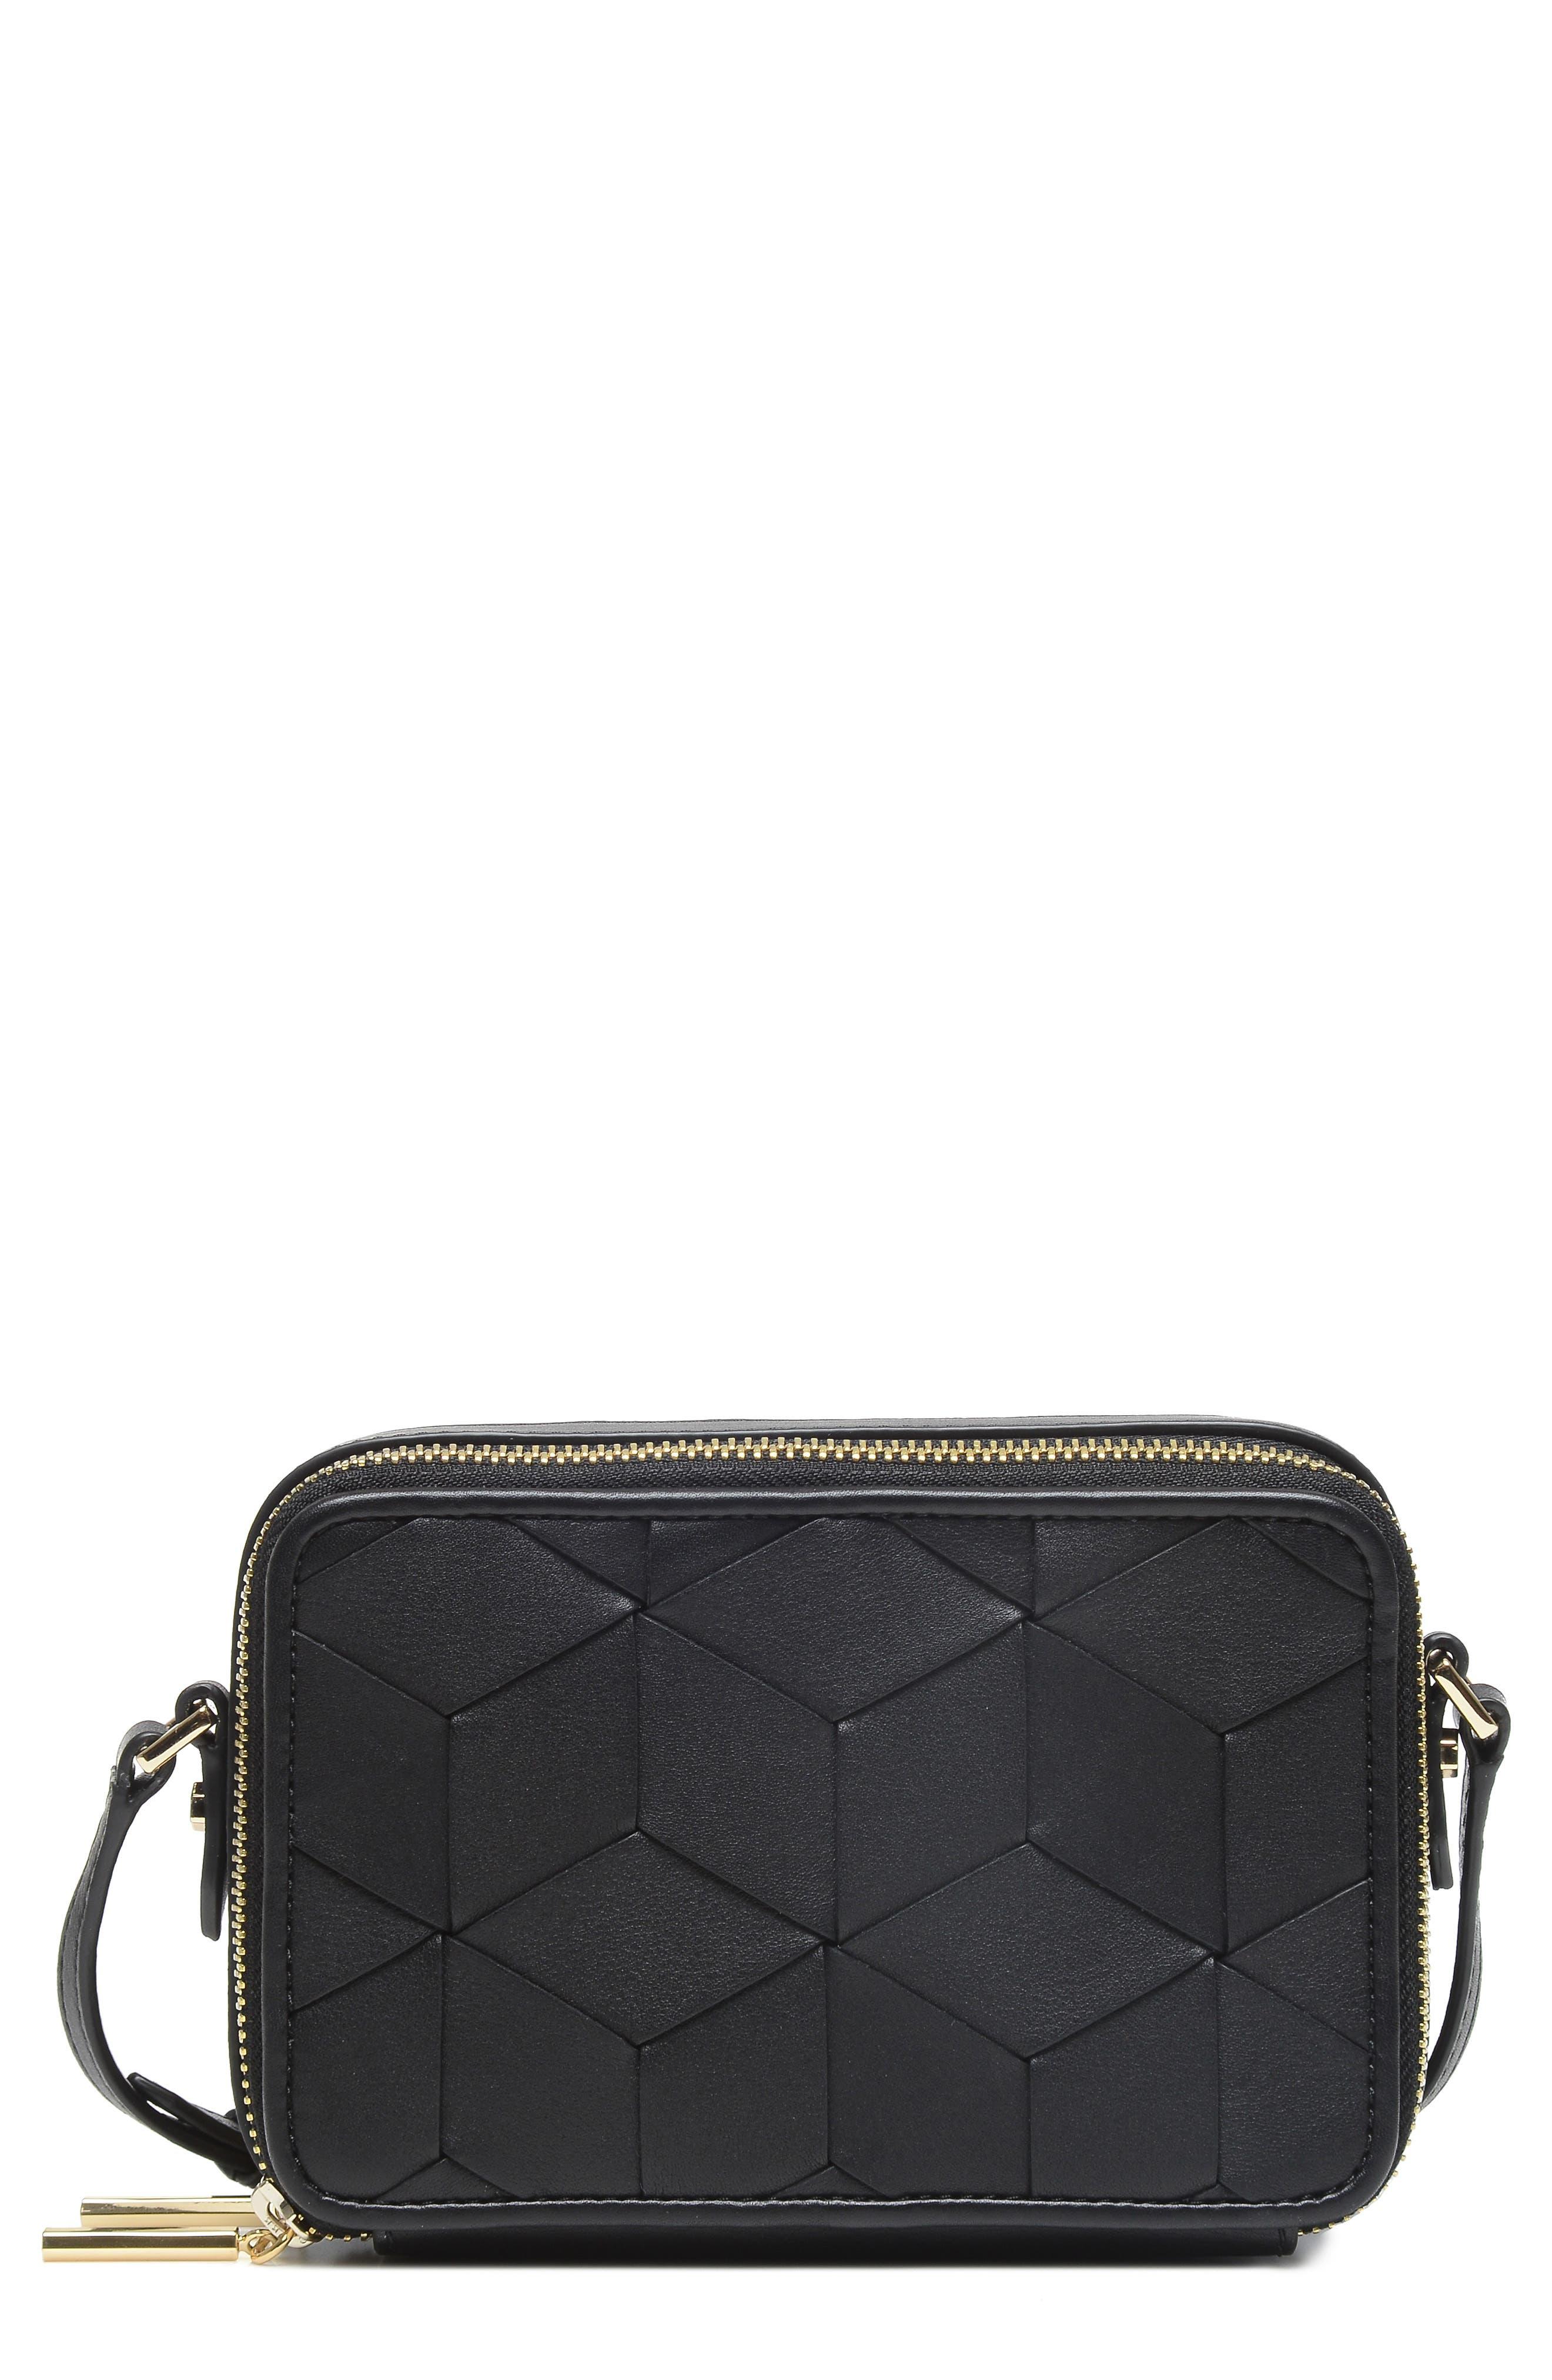 Roam Leather Camera Bag,                             Main thumbnail 1, color,                             BLACK